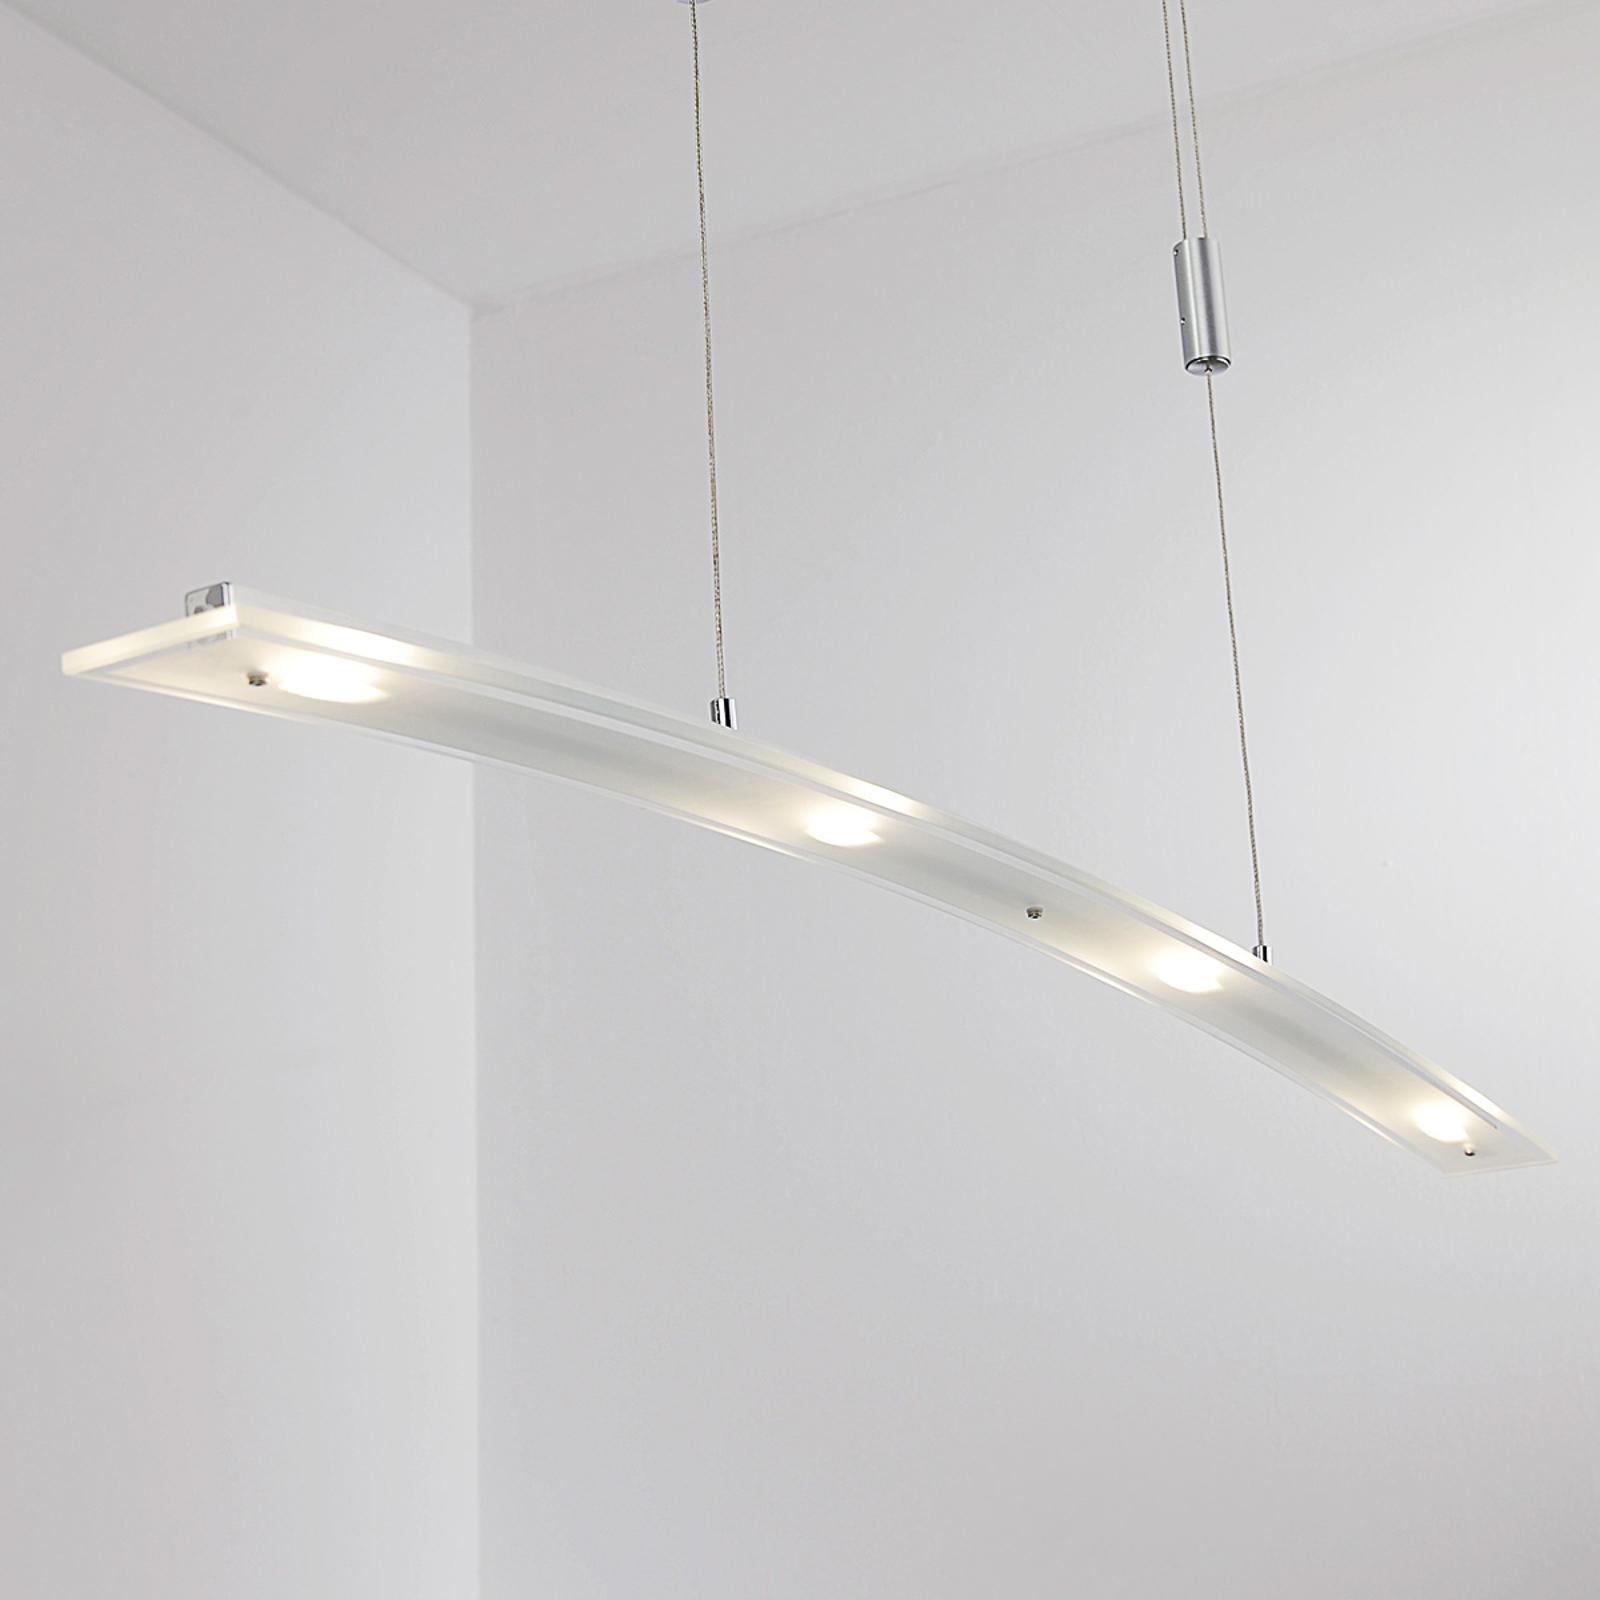 Juna - LED-riippuvalaisin, lasivarjostin, 98 cm